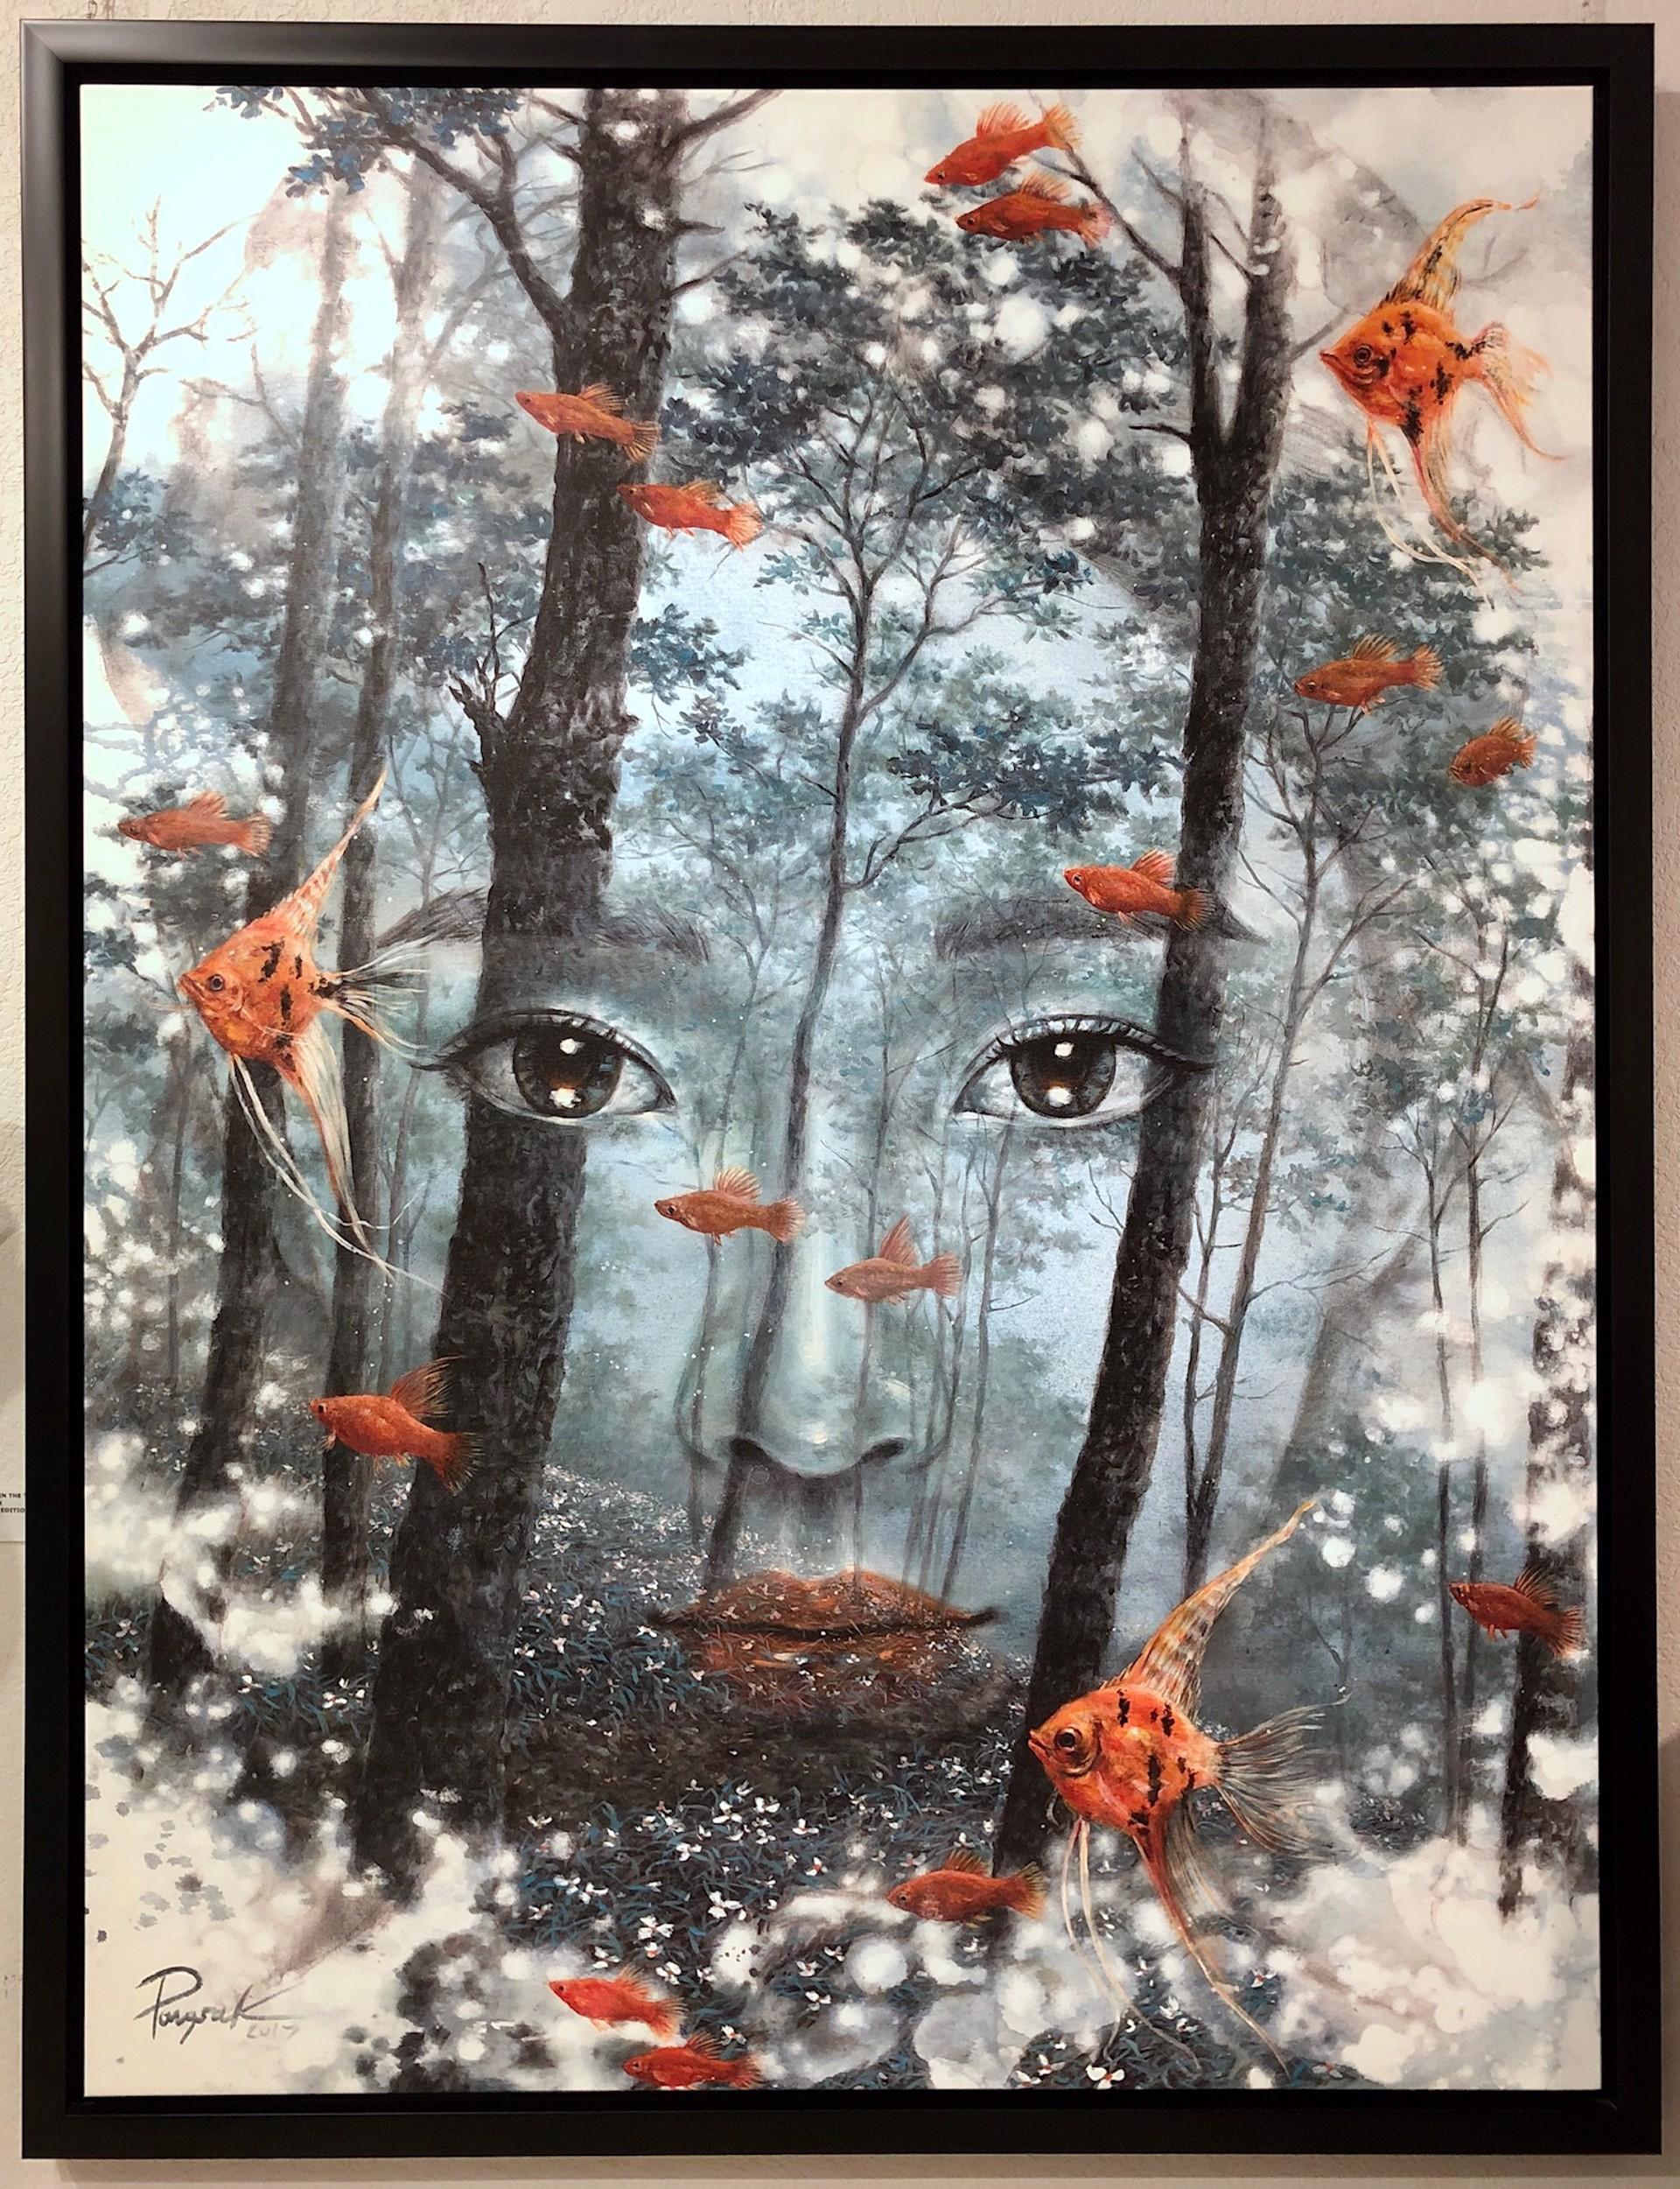 Face in the Forest by Pongsak Kamjornrasamekit